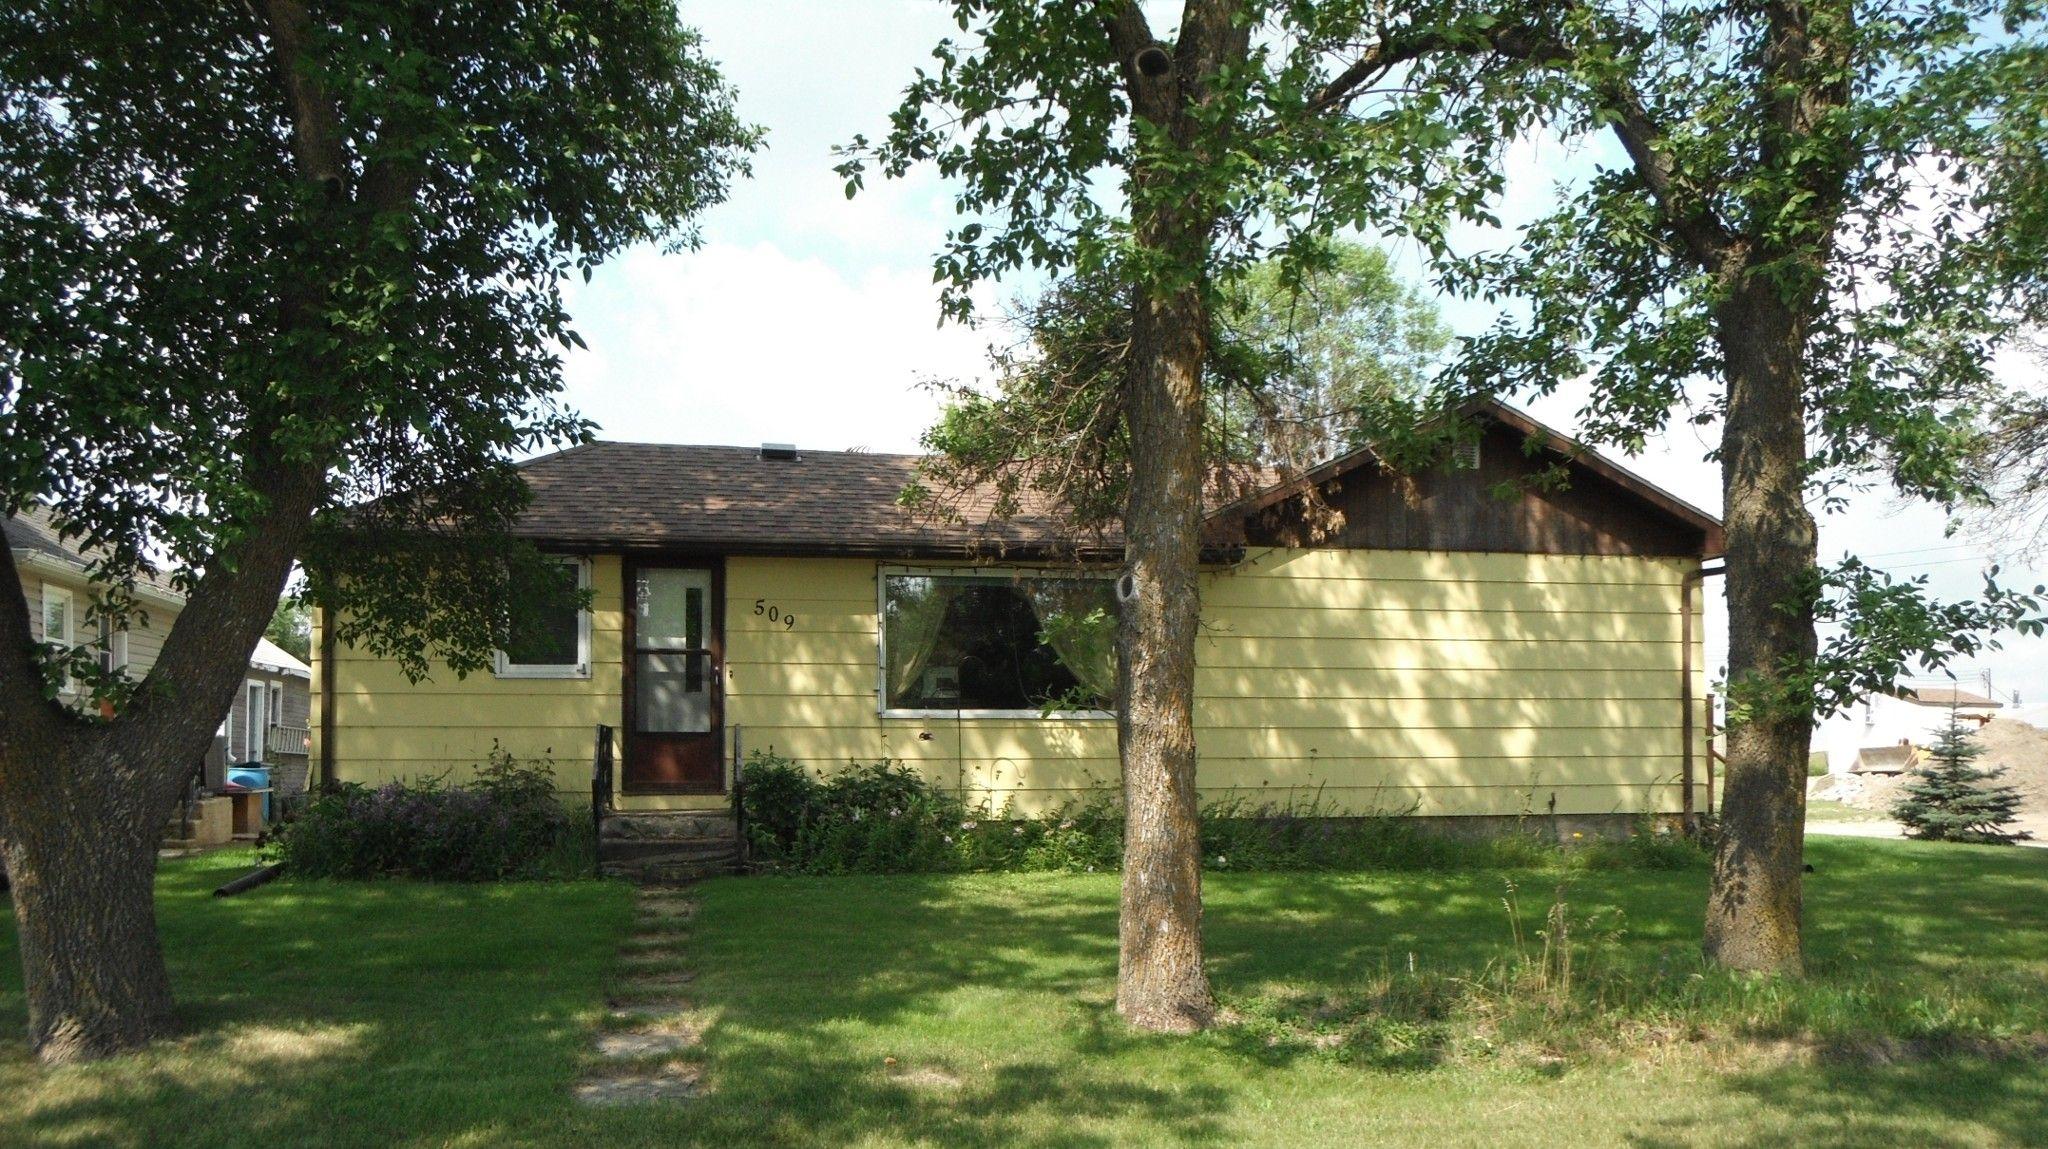 Main Photo: 509 King in Killarney: House for sale : MLS®# 1824594